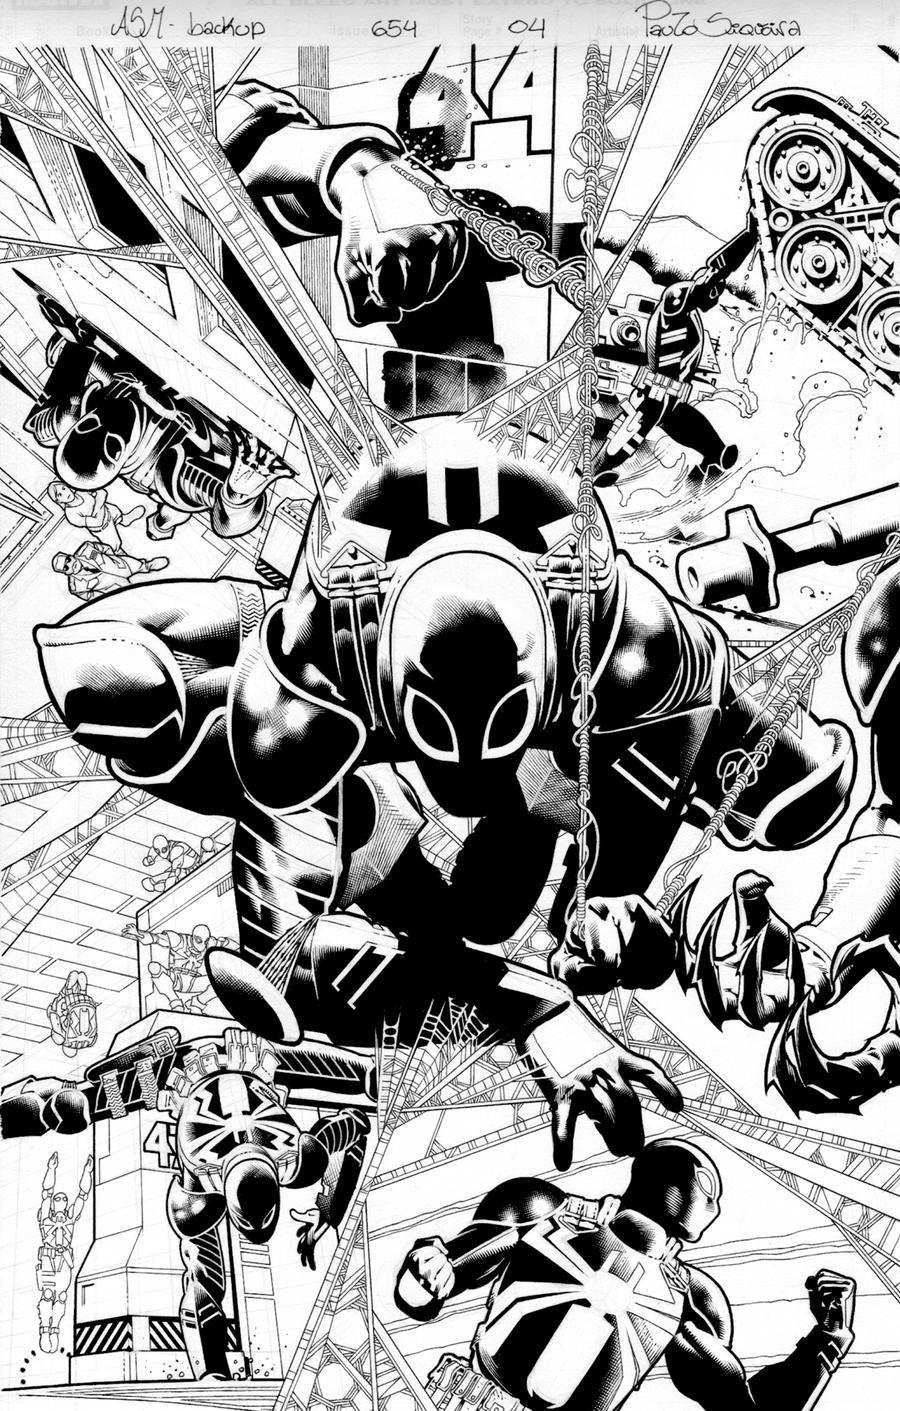 Amazing Spider man 654 page